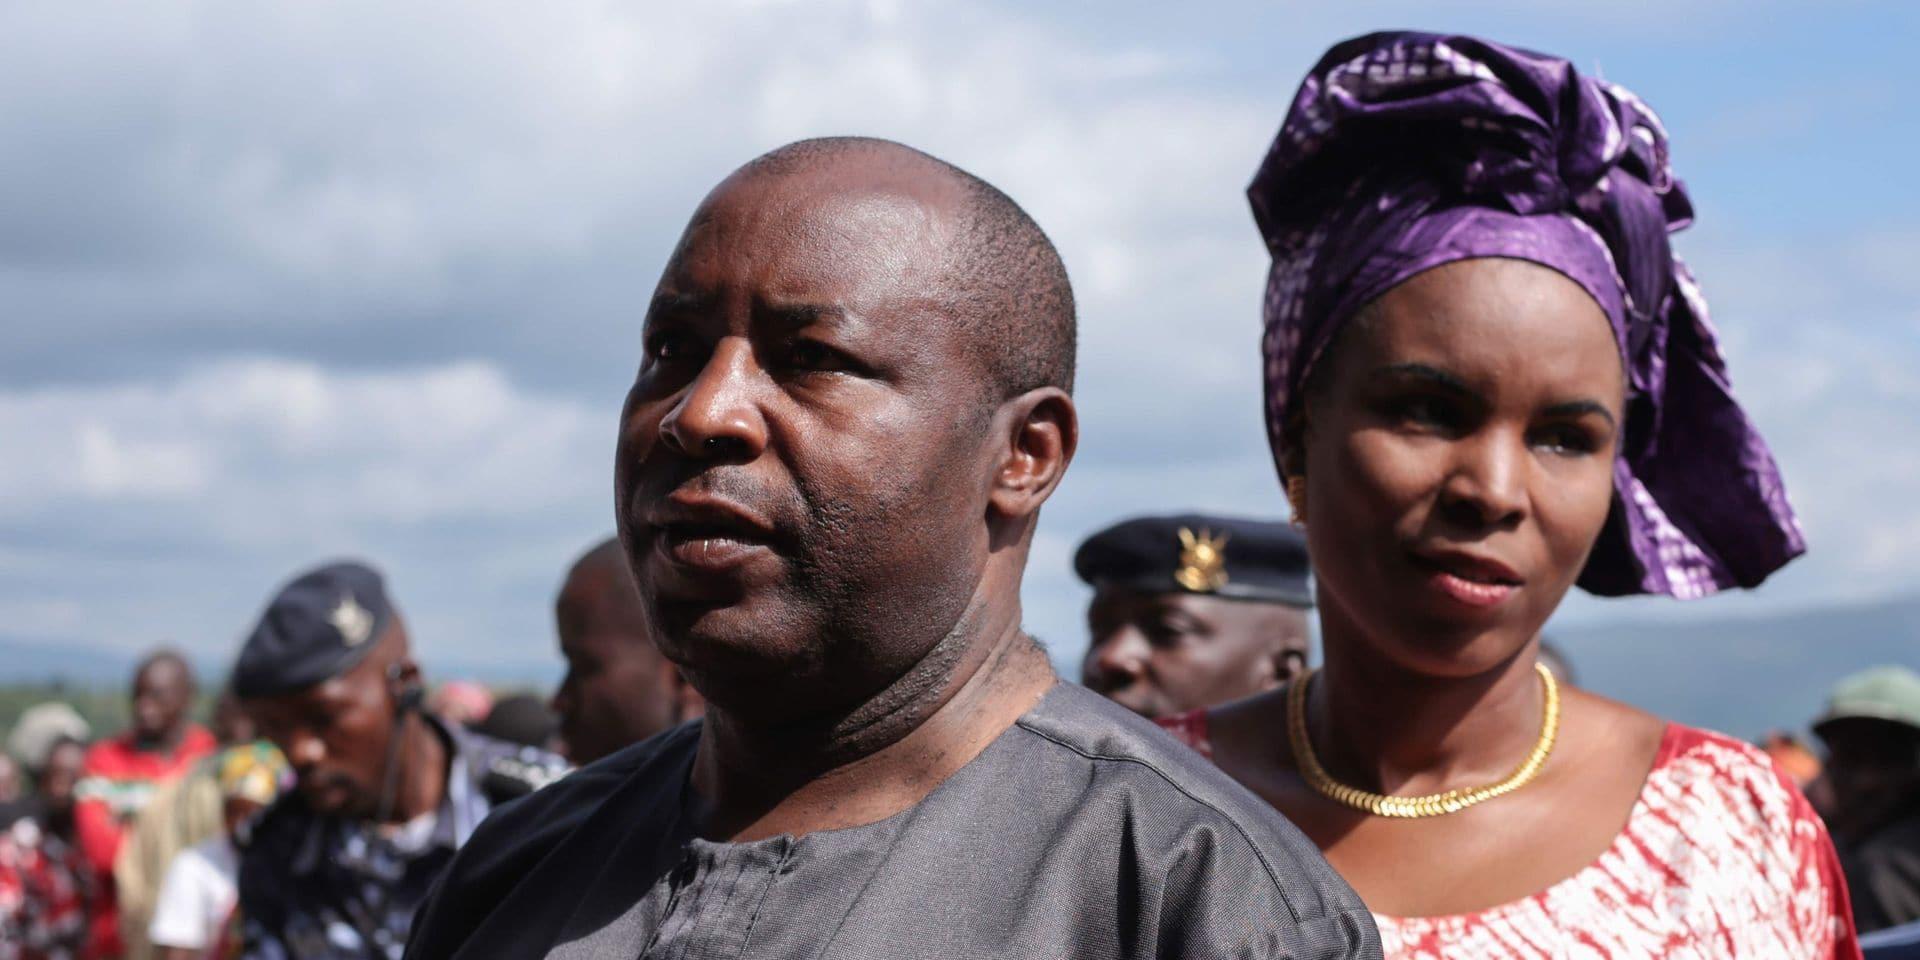 Burundi: le recours de l'opposition rejeté, Ndayishimiye proclamé président élu